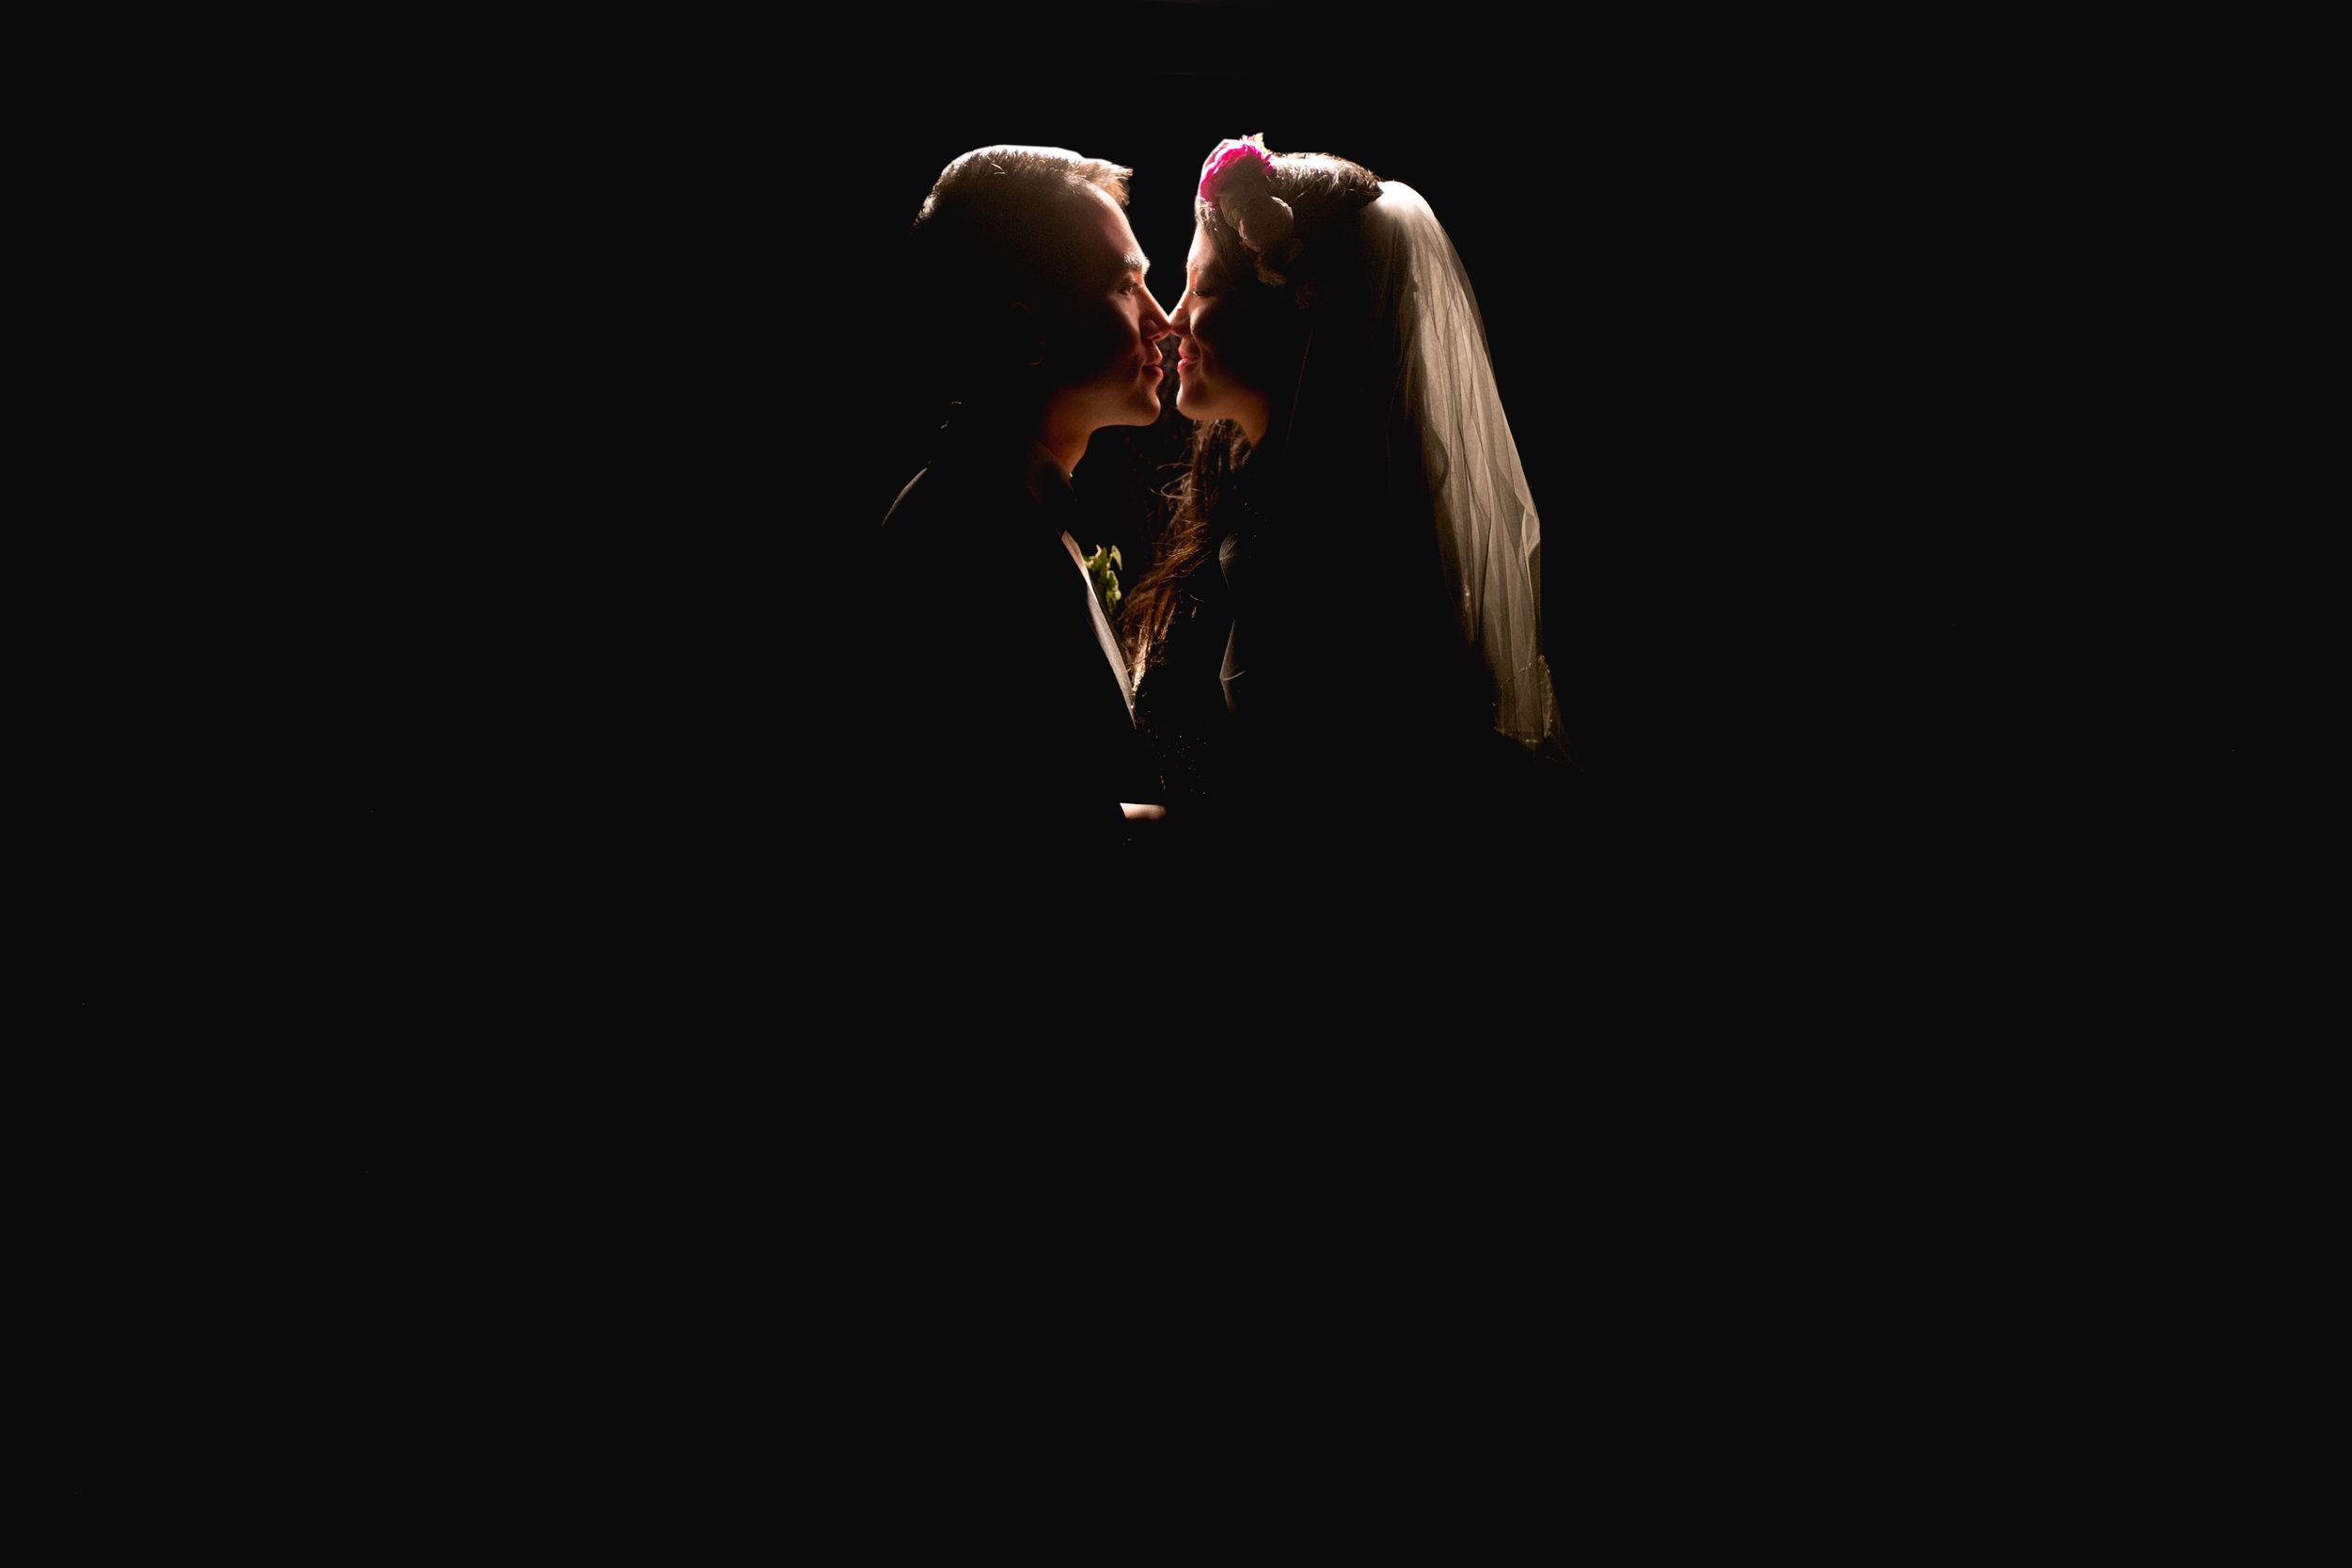 bride and groom silhouette portrait.jpg